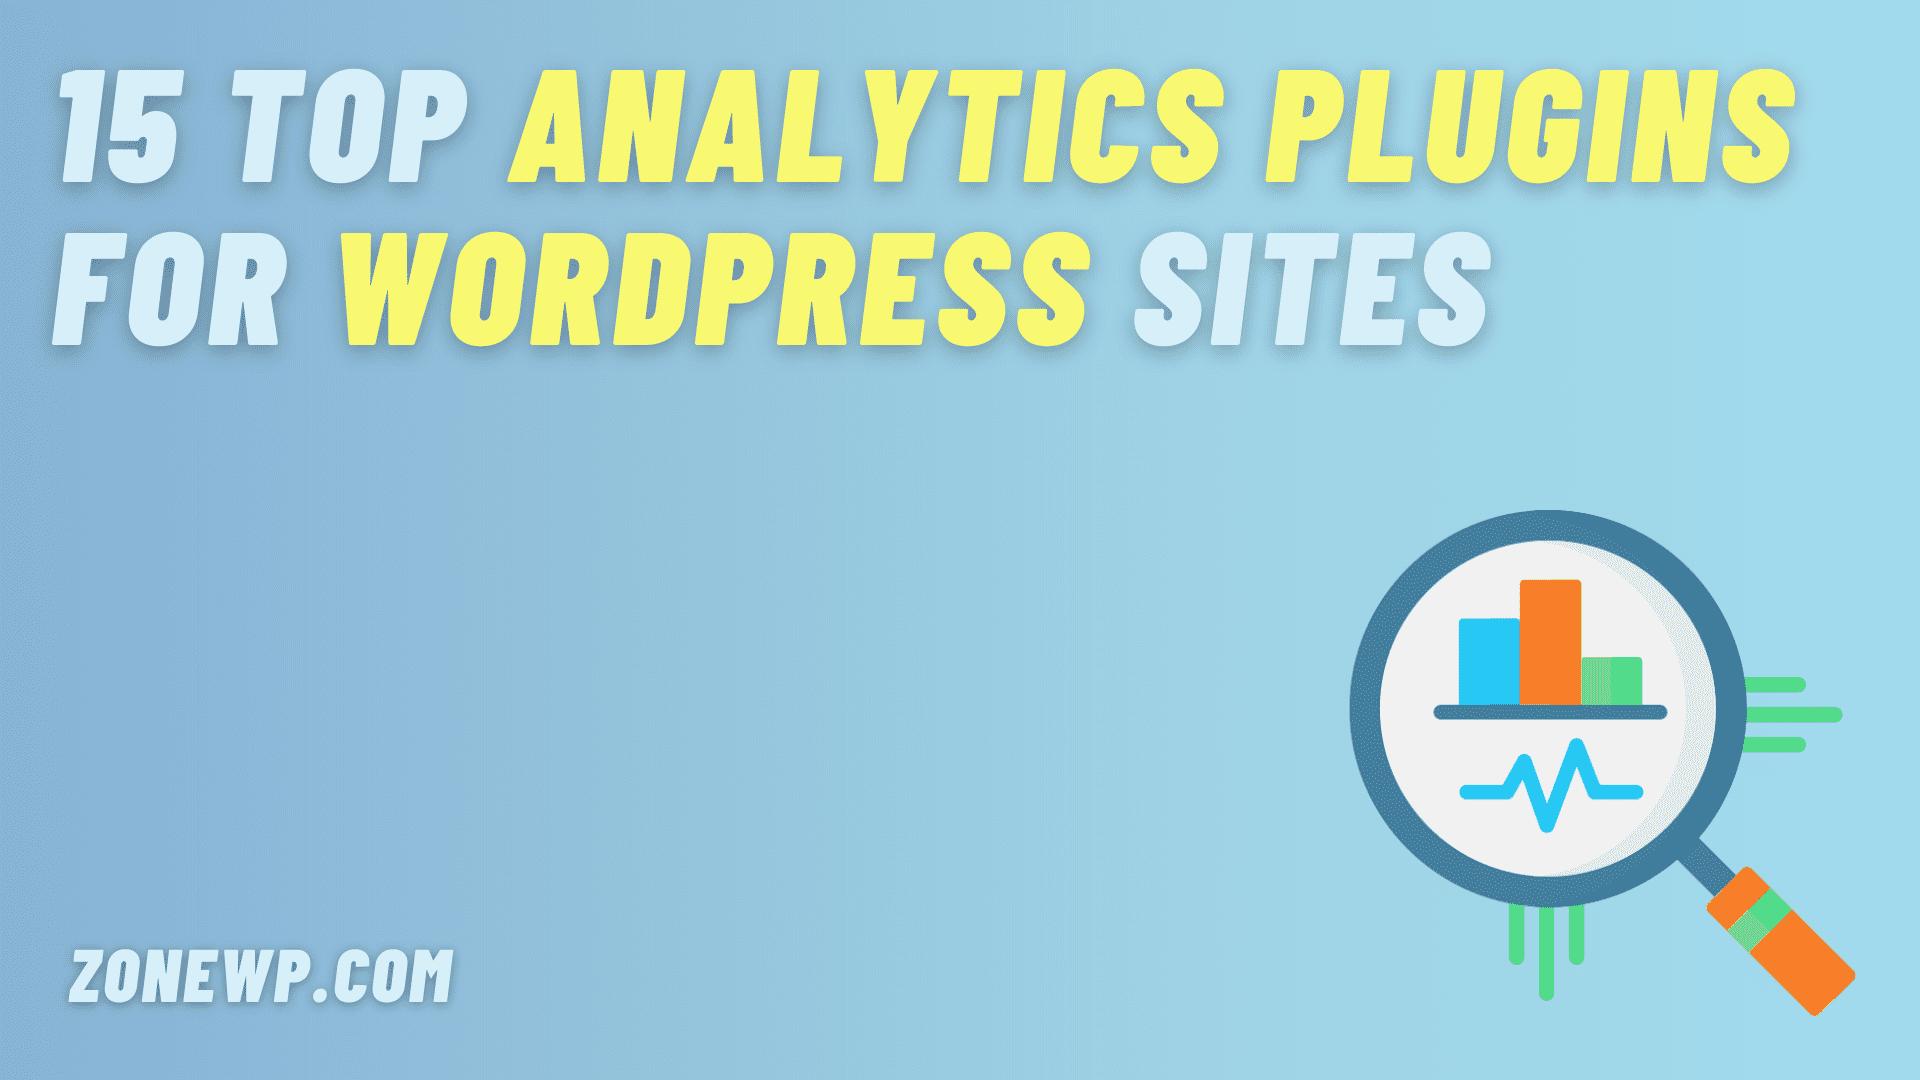 15 Top Analytics Plugins for WordPress Sites